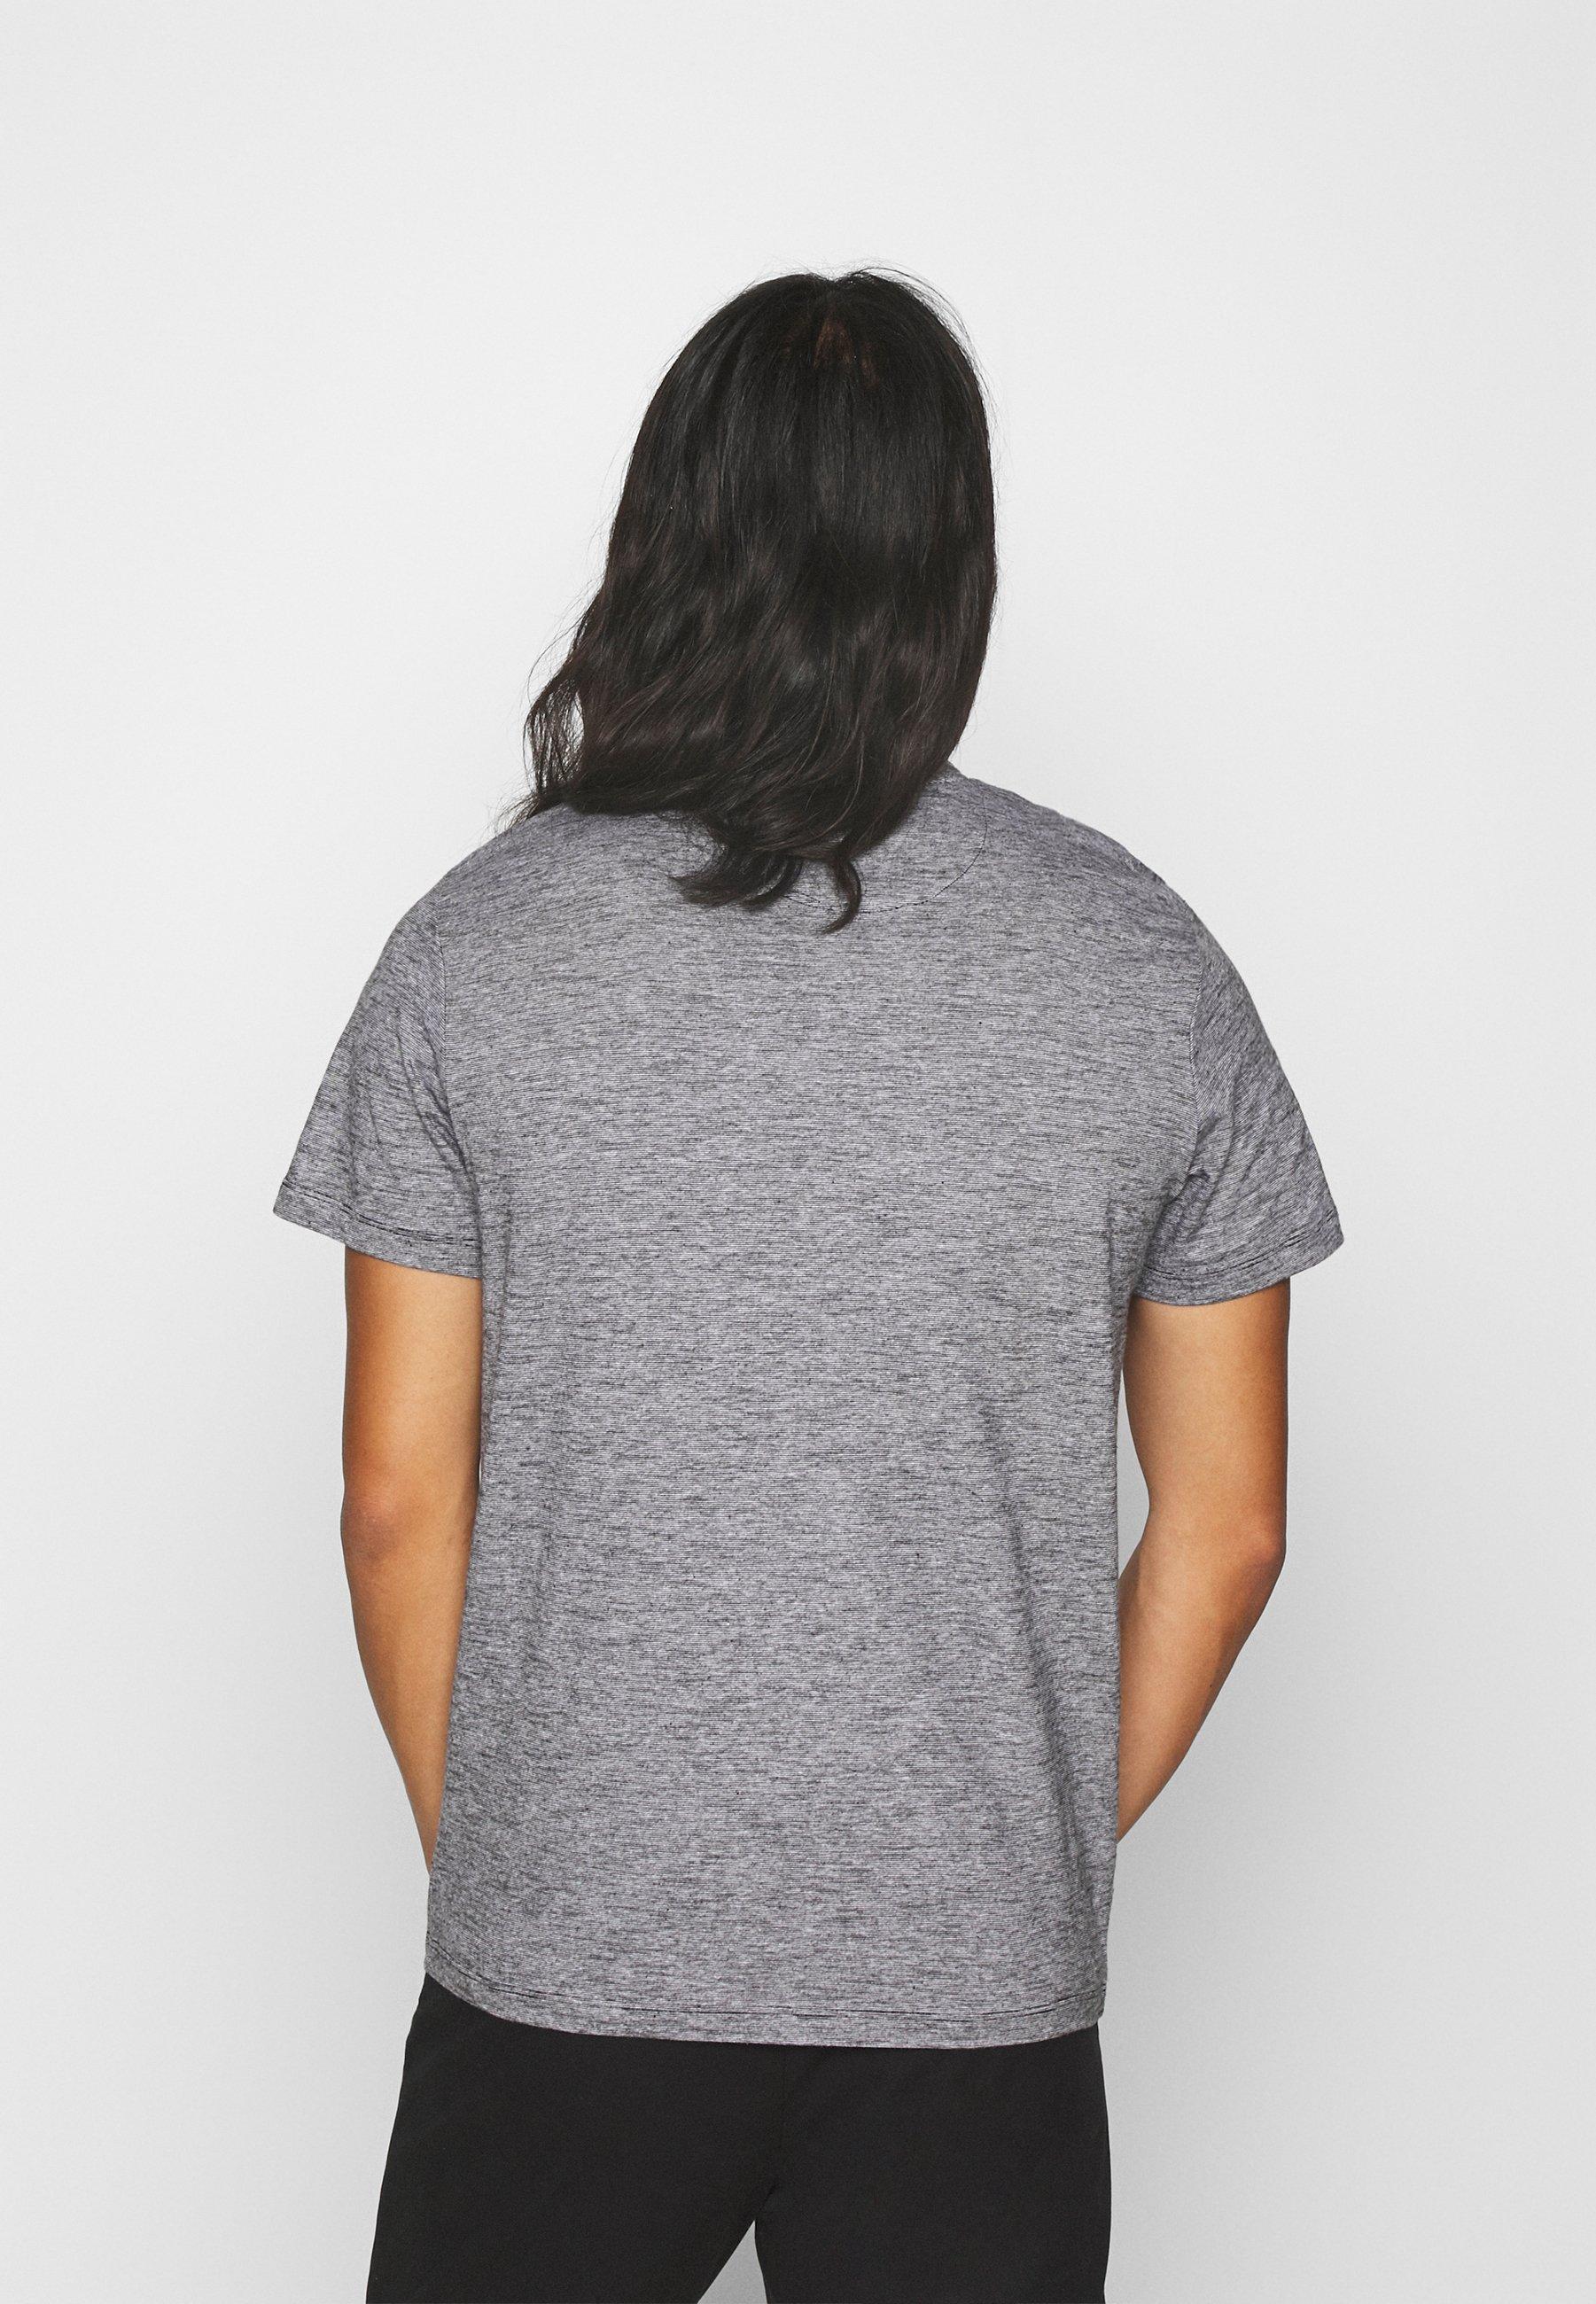 TOM TAILOR FINELINER WITH POCKET - Print T-shirt - black thin white stripe 7qCin